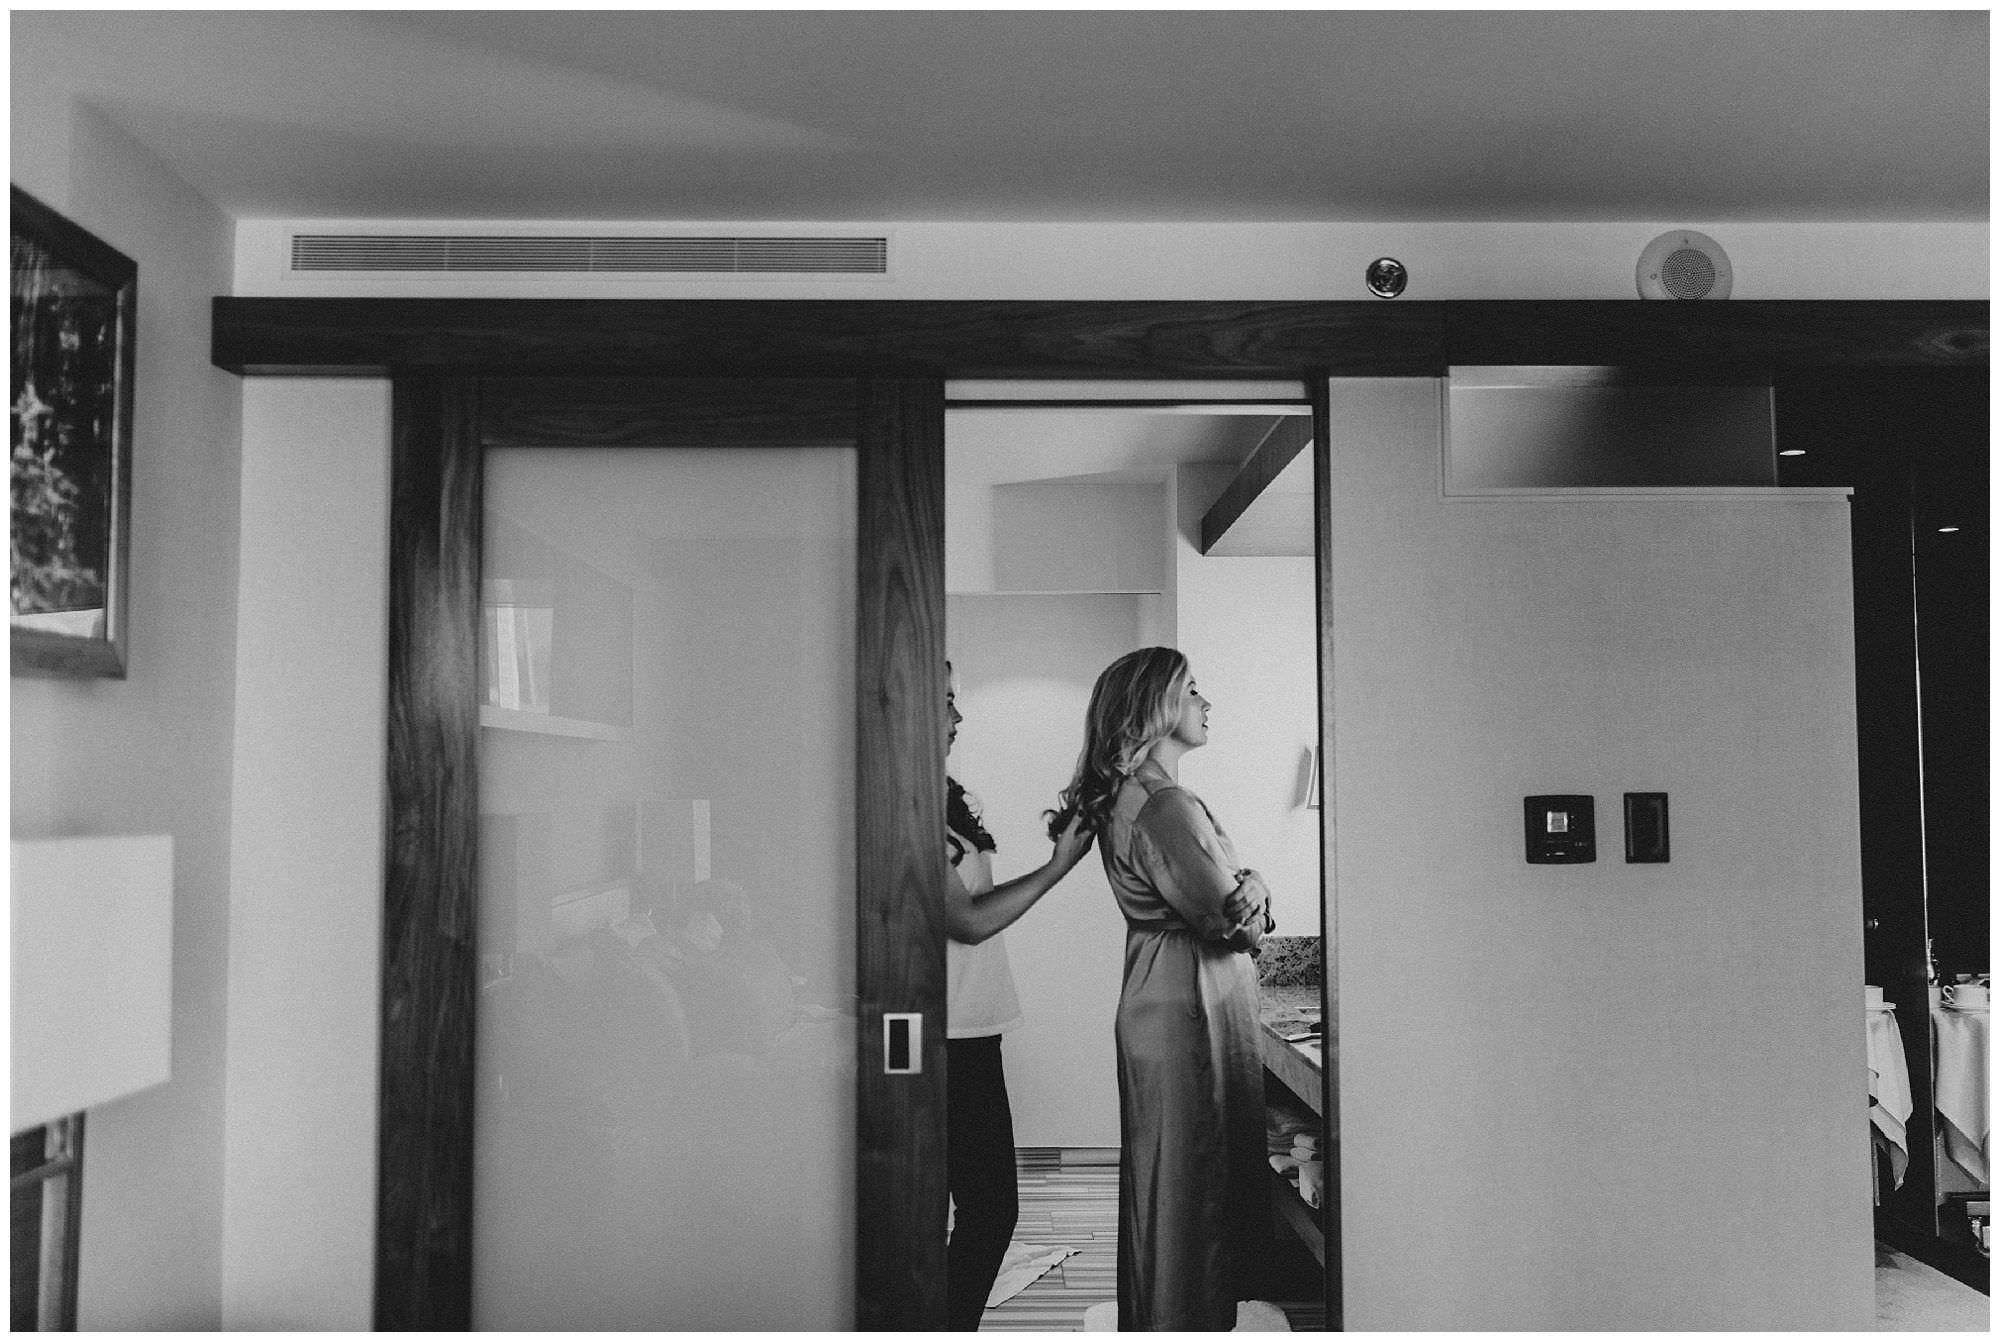 Dr. Sun Yat-Sen Classical Chinese Gardens, Vancouver Wedding Photographer, BC wedding photographer, best wedding photographer, creative wedding, non-traditional wedding, garden wedding, outdoor wedding, handmade wedding dress, Wilfred, Aritzia wedding dress, mature bride, Ronnie Lee Hill Photography, affordable wedding photographer